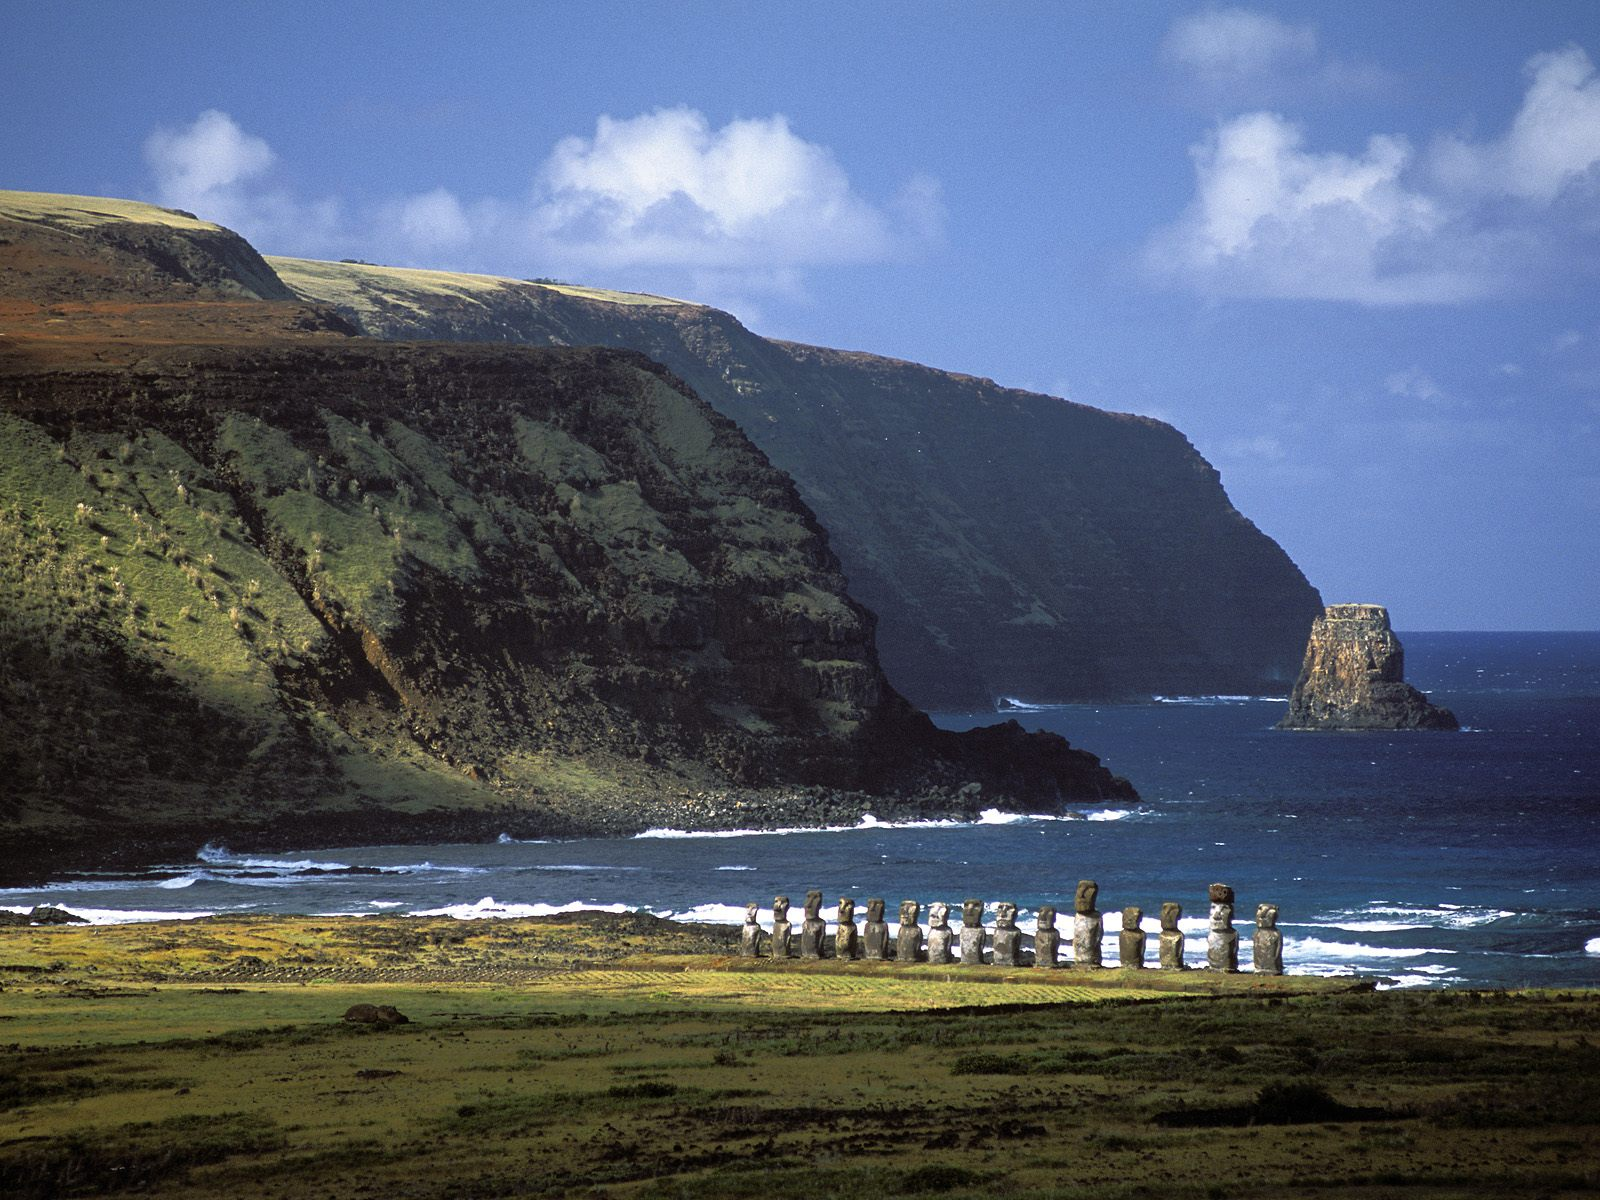 Moai-Statues-Easter-Island-21